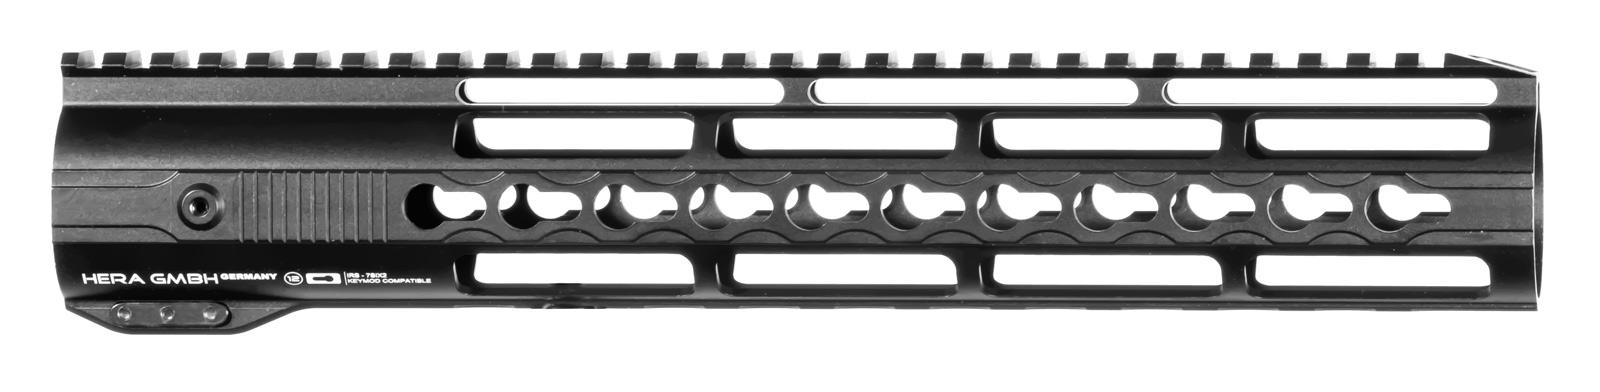 ar-10-rail-308-12-hera-arms-keymod-ar-10-handguard-rail